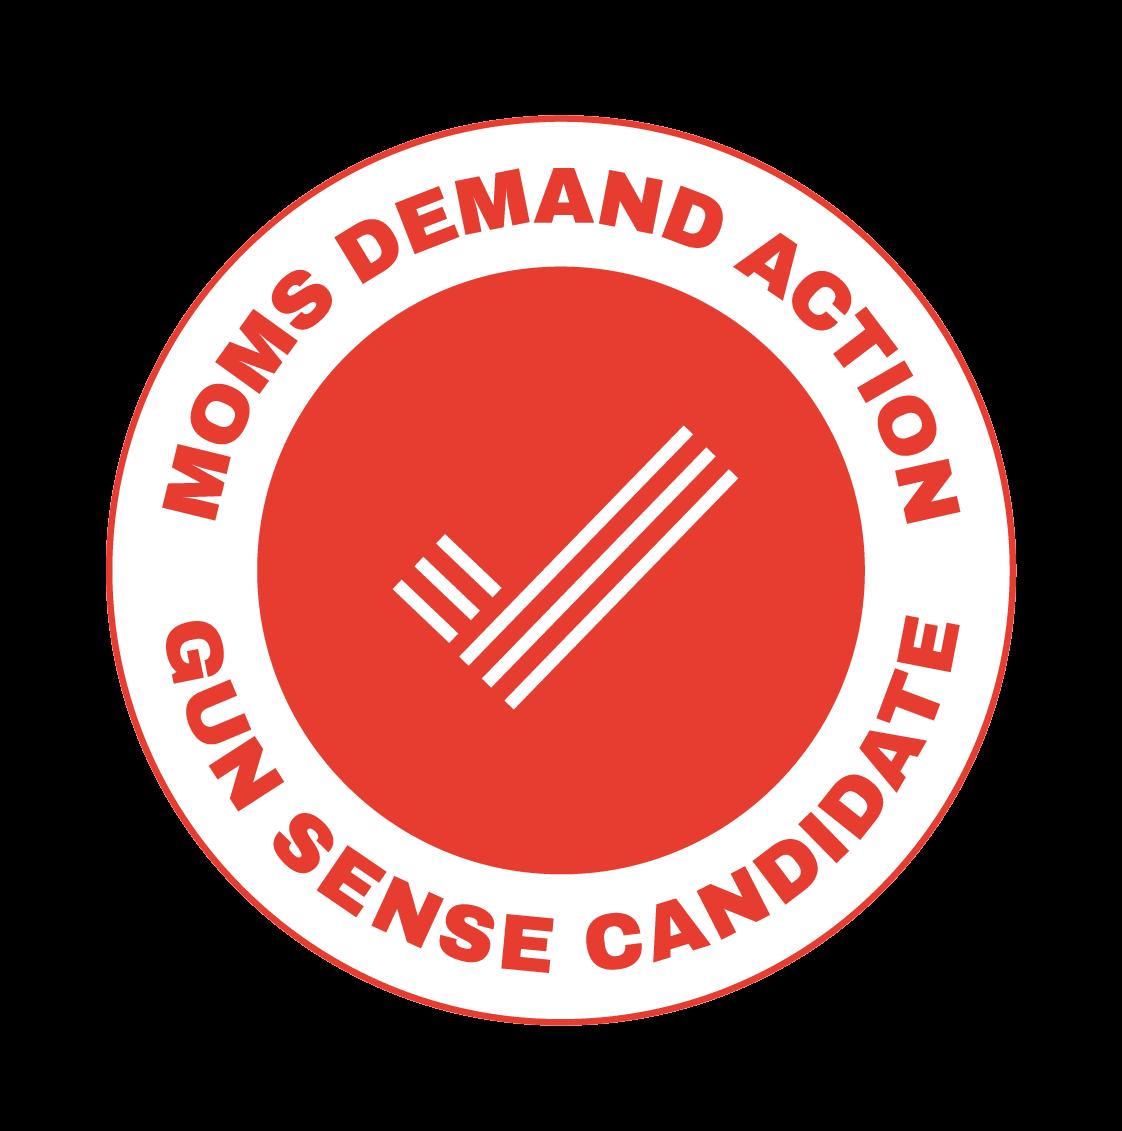 mda-gun-sense-candidate